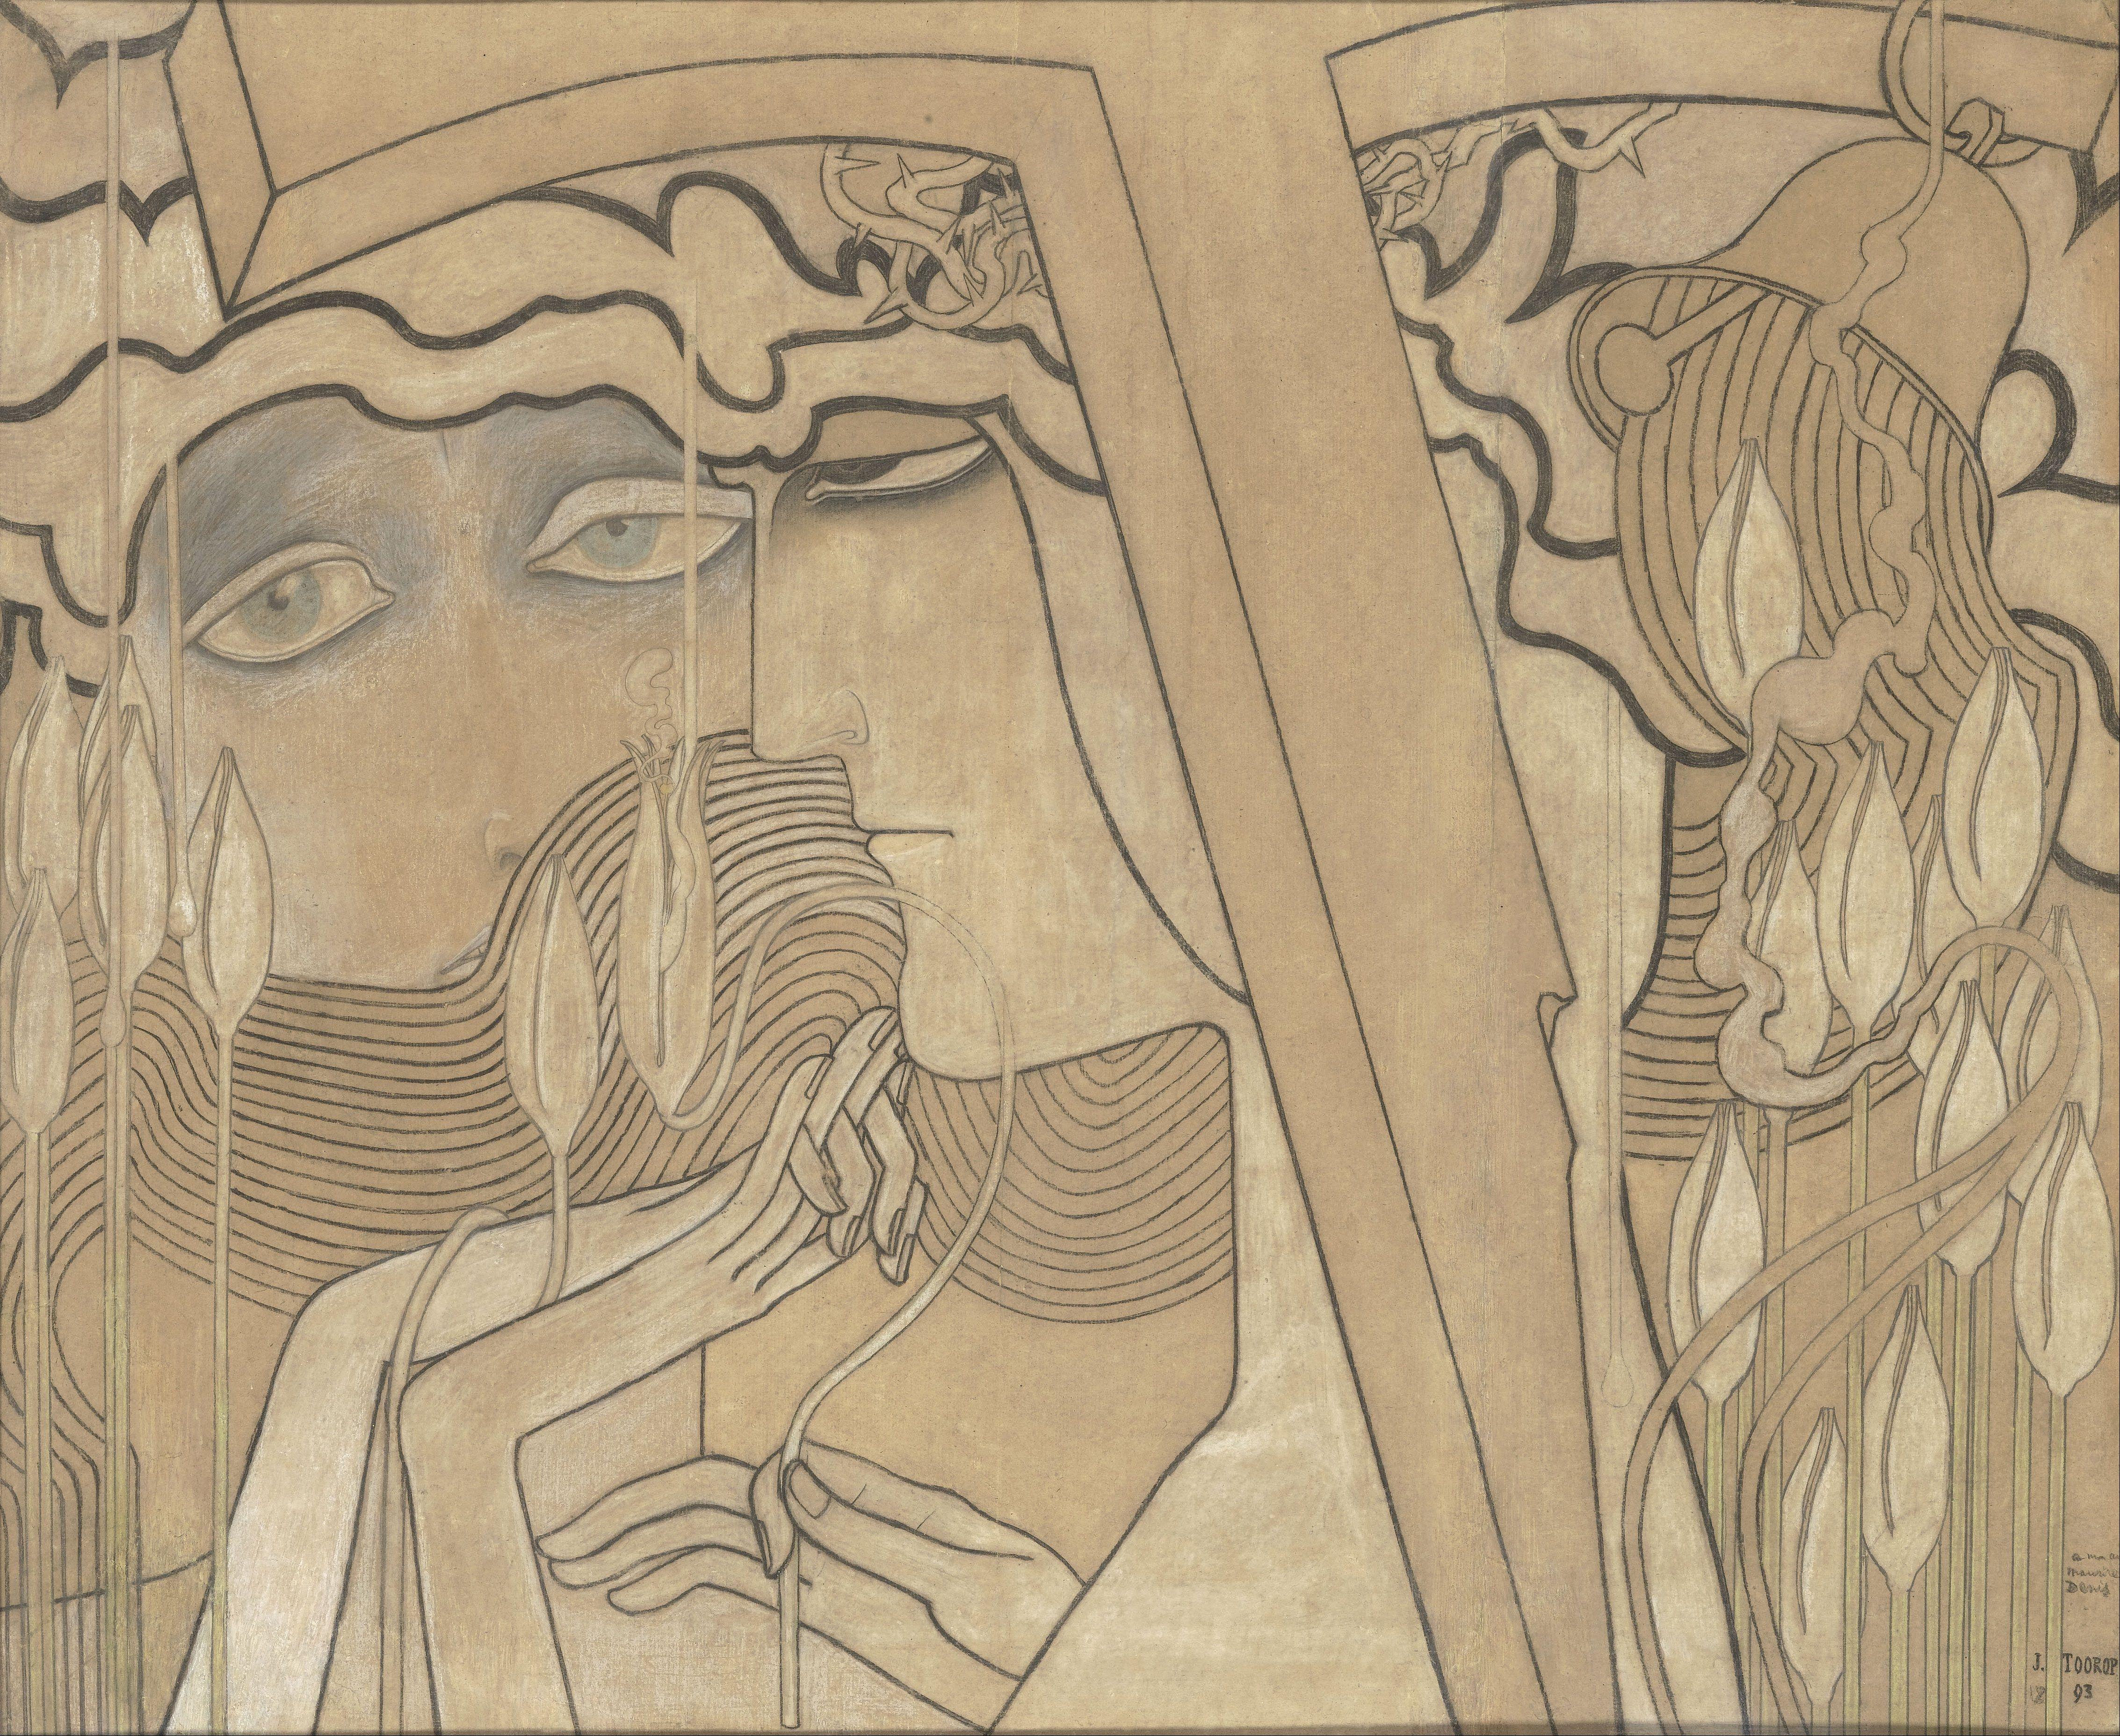 Jan Toorop - Desire and Satisfaction, 1893